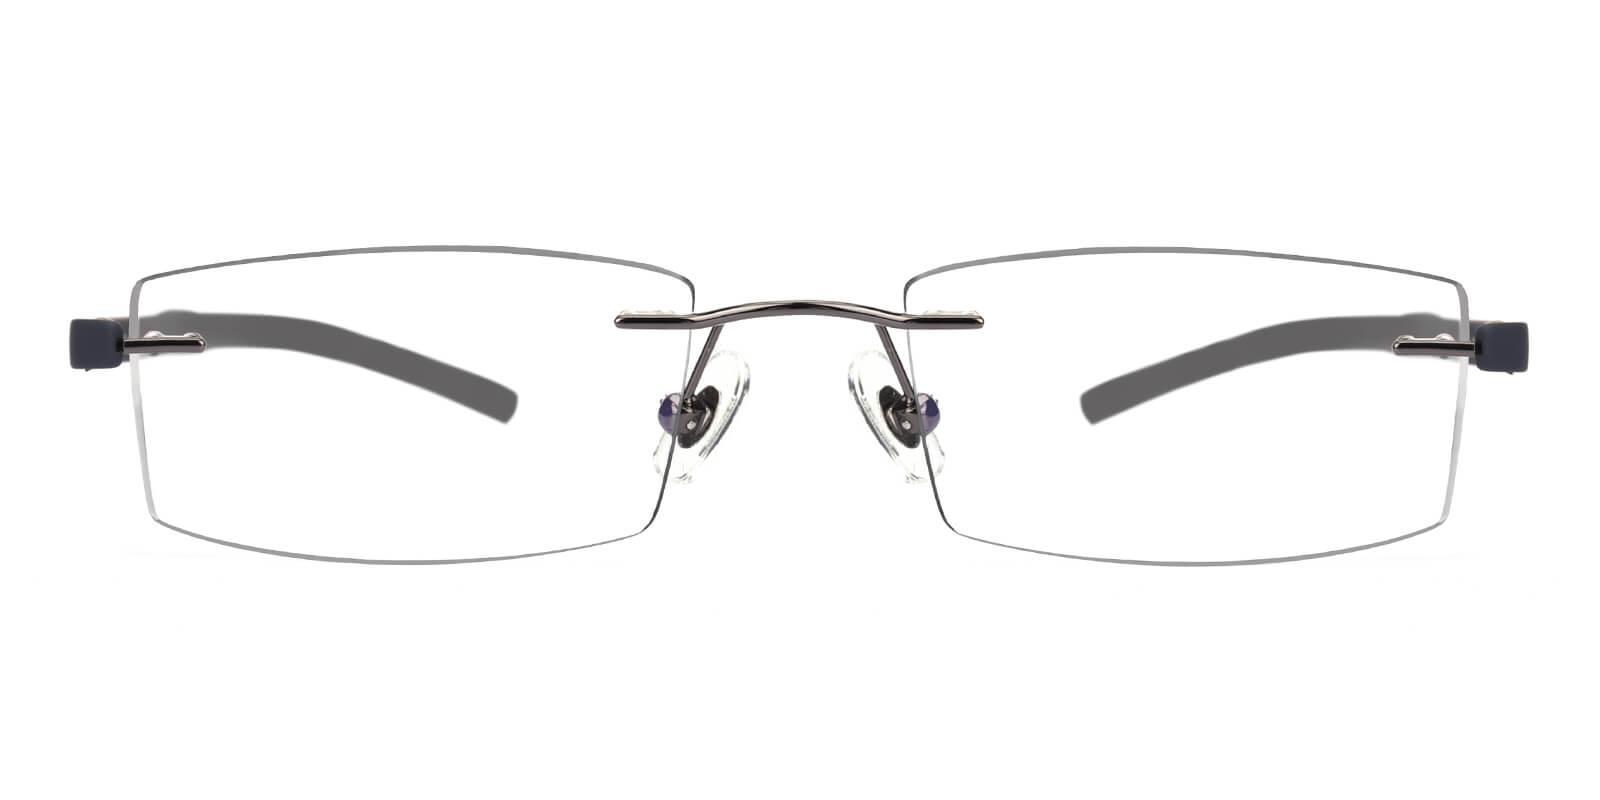 Trimming-Gray-Varieties-Acetate / Metal-Eyeglasses-additional2